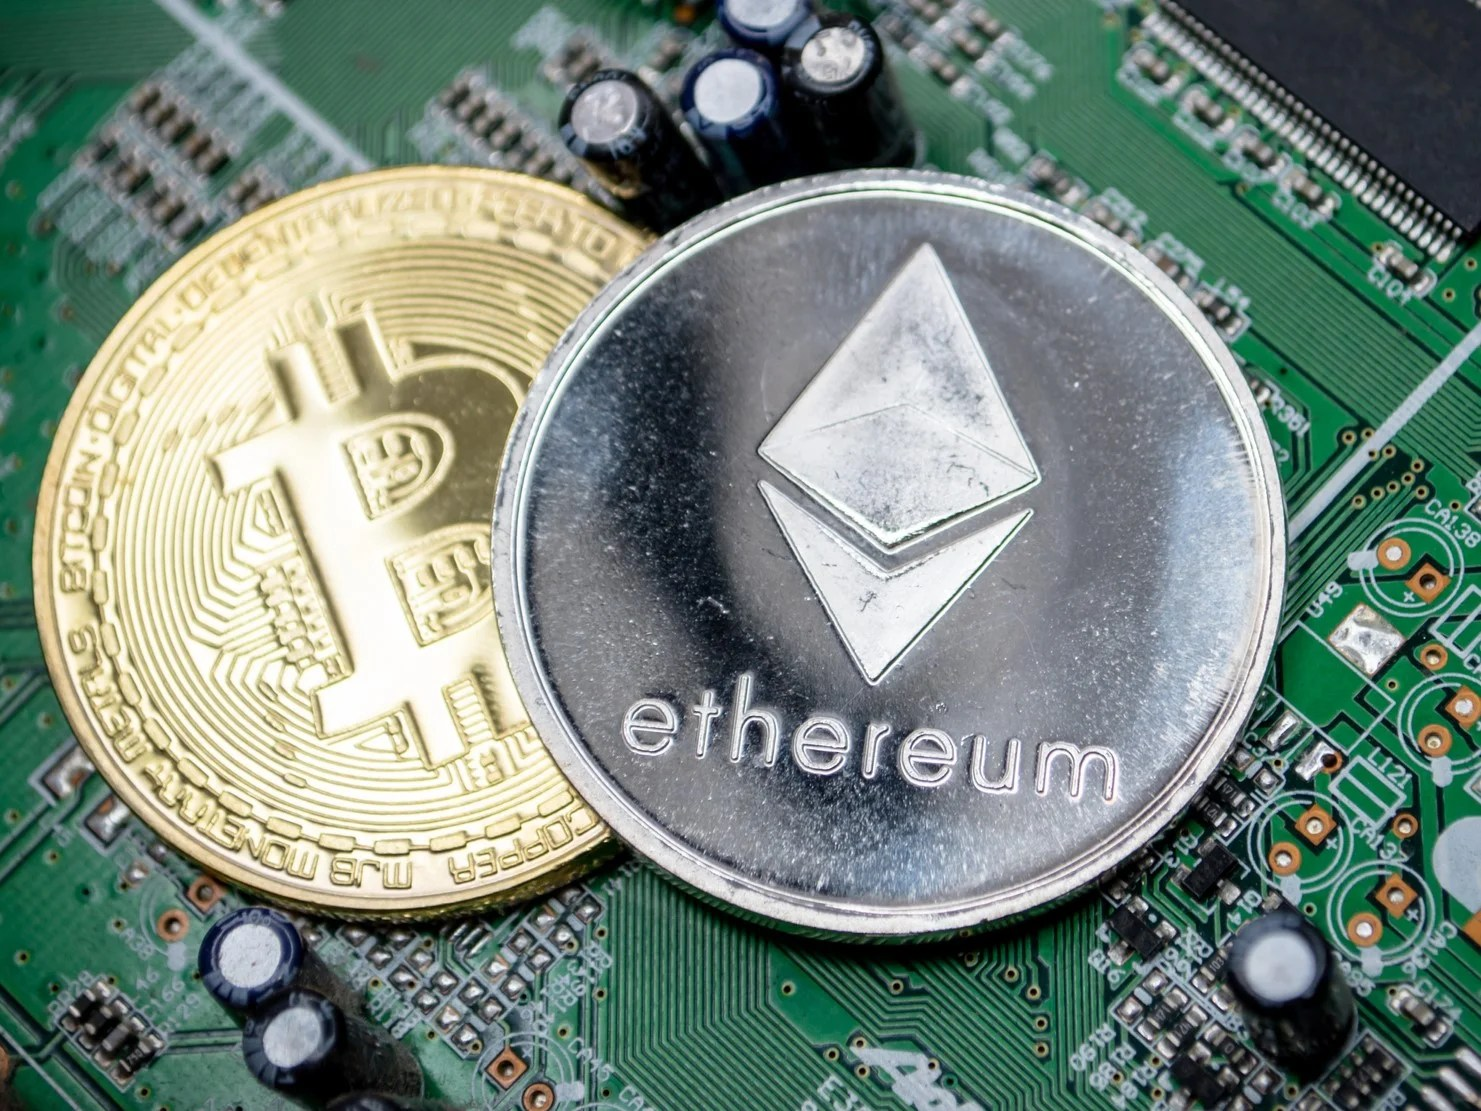 ethereum%20overtakes%20bitcoin